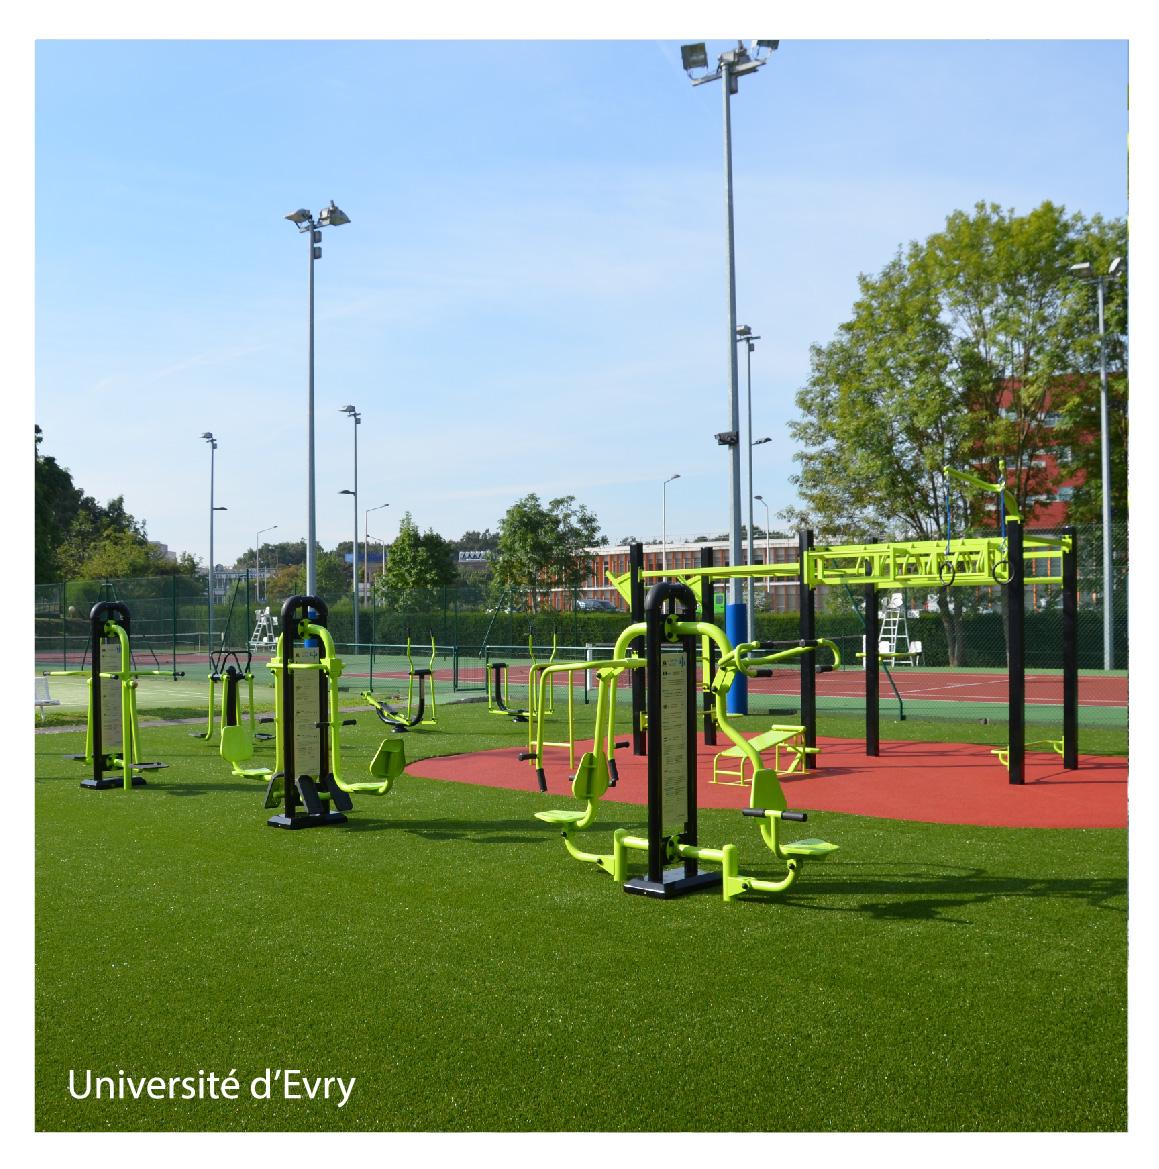 Freetness fitness plein air for Parc enfant yvelines